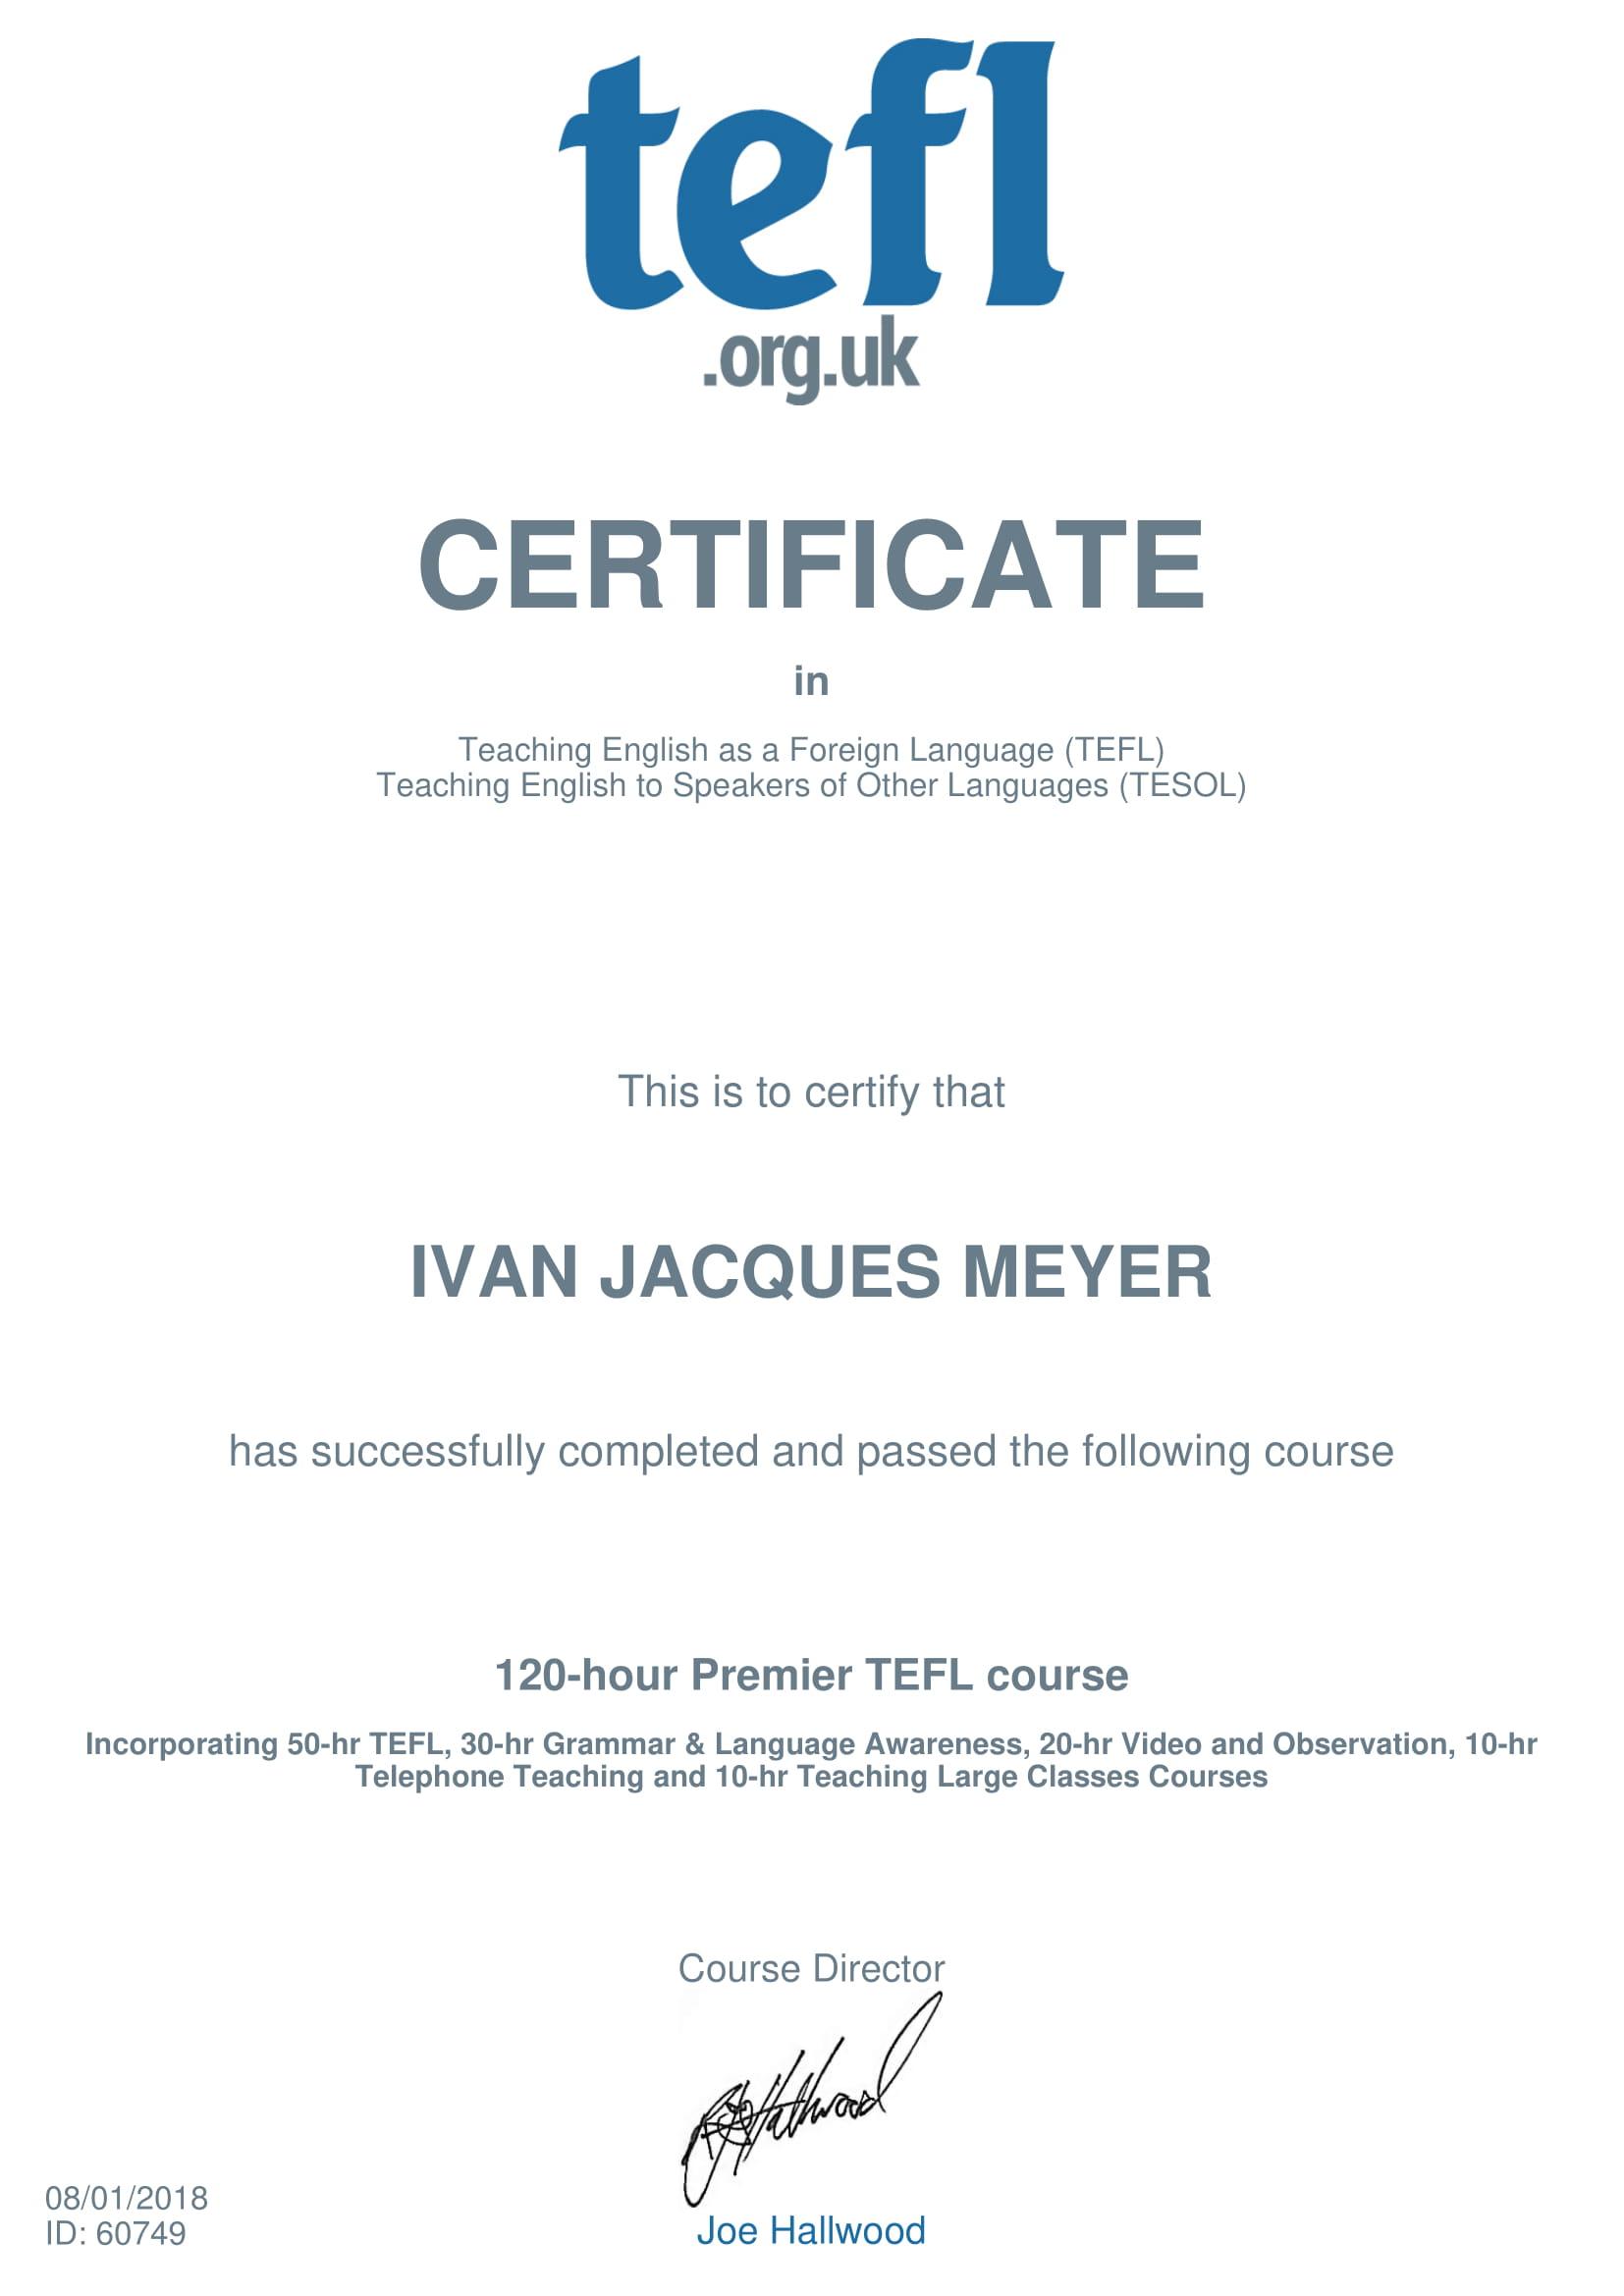 TEFL certification proof final 1